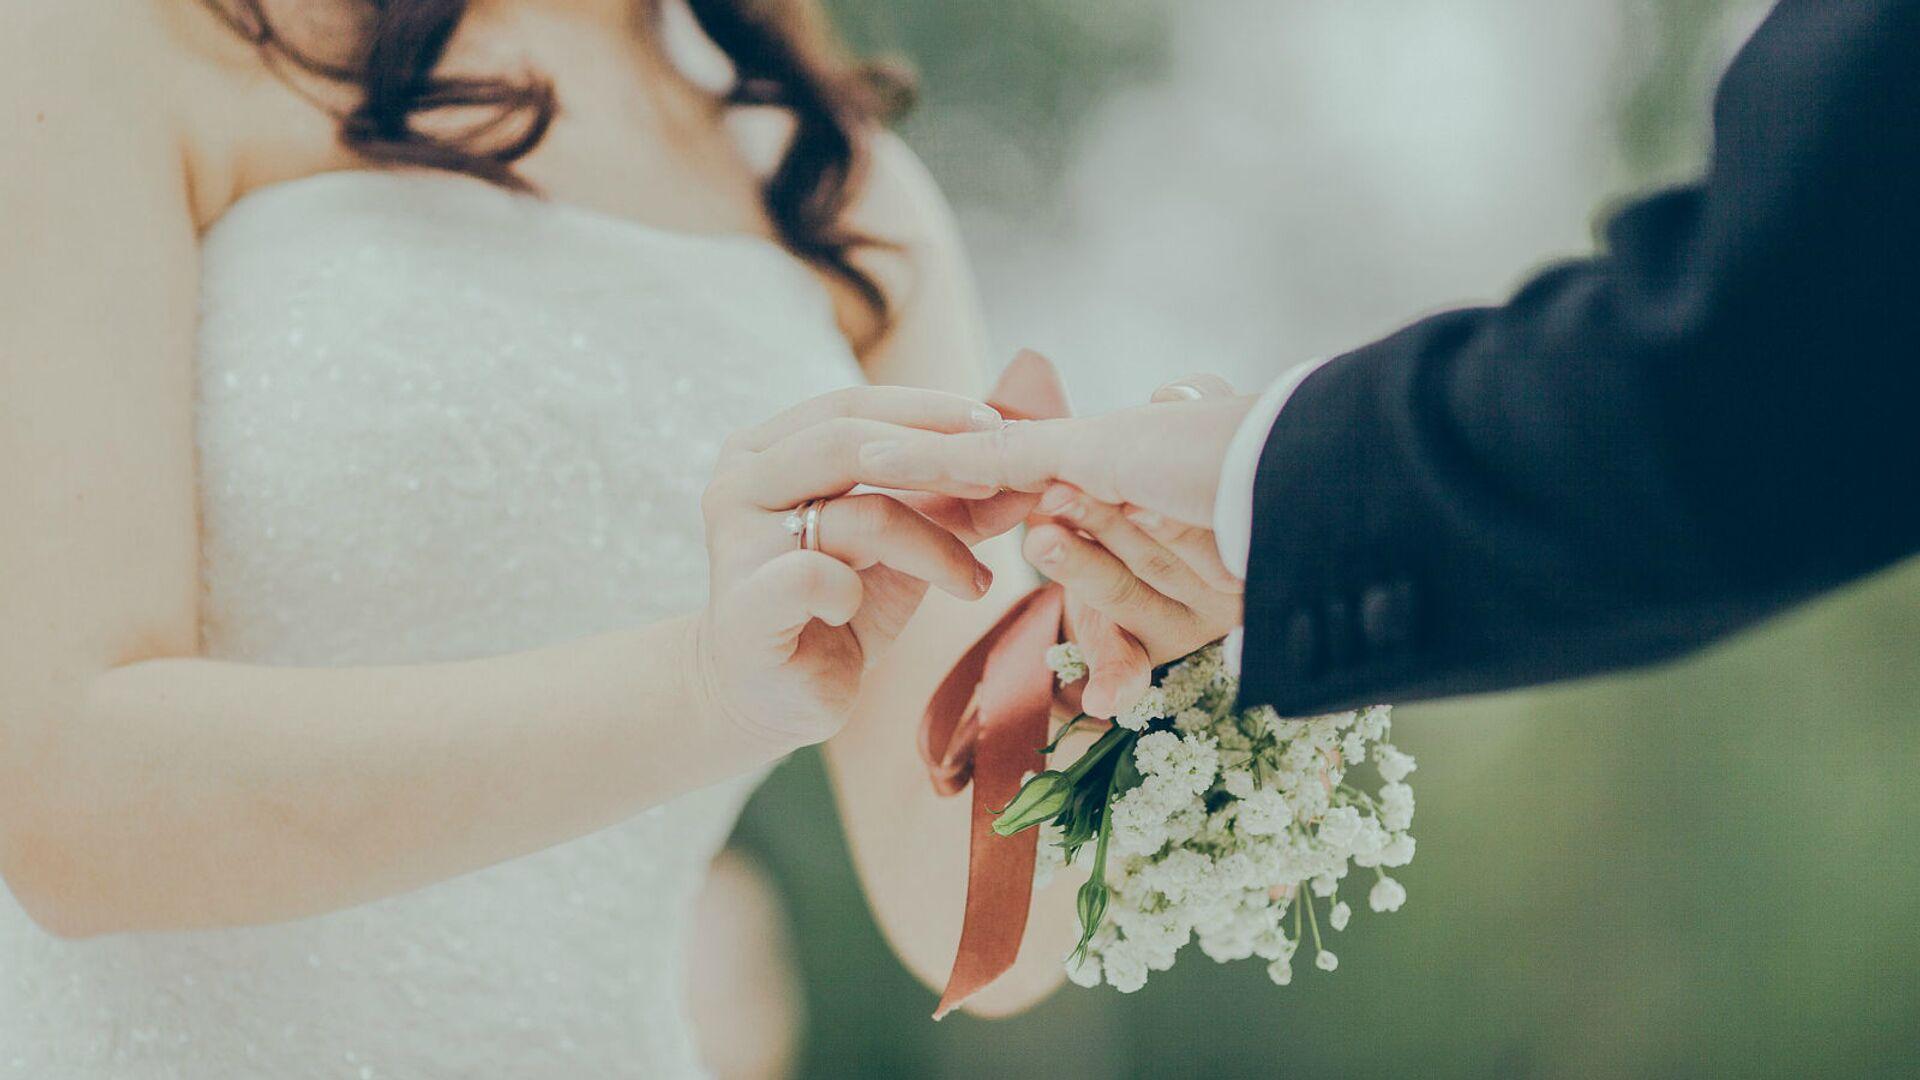 Жених и невеста надевают друг другу кольца - Sputnik Արմենիա, 1920, 13.07.2021